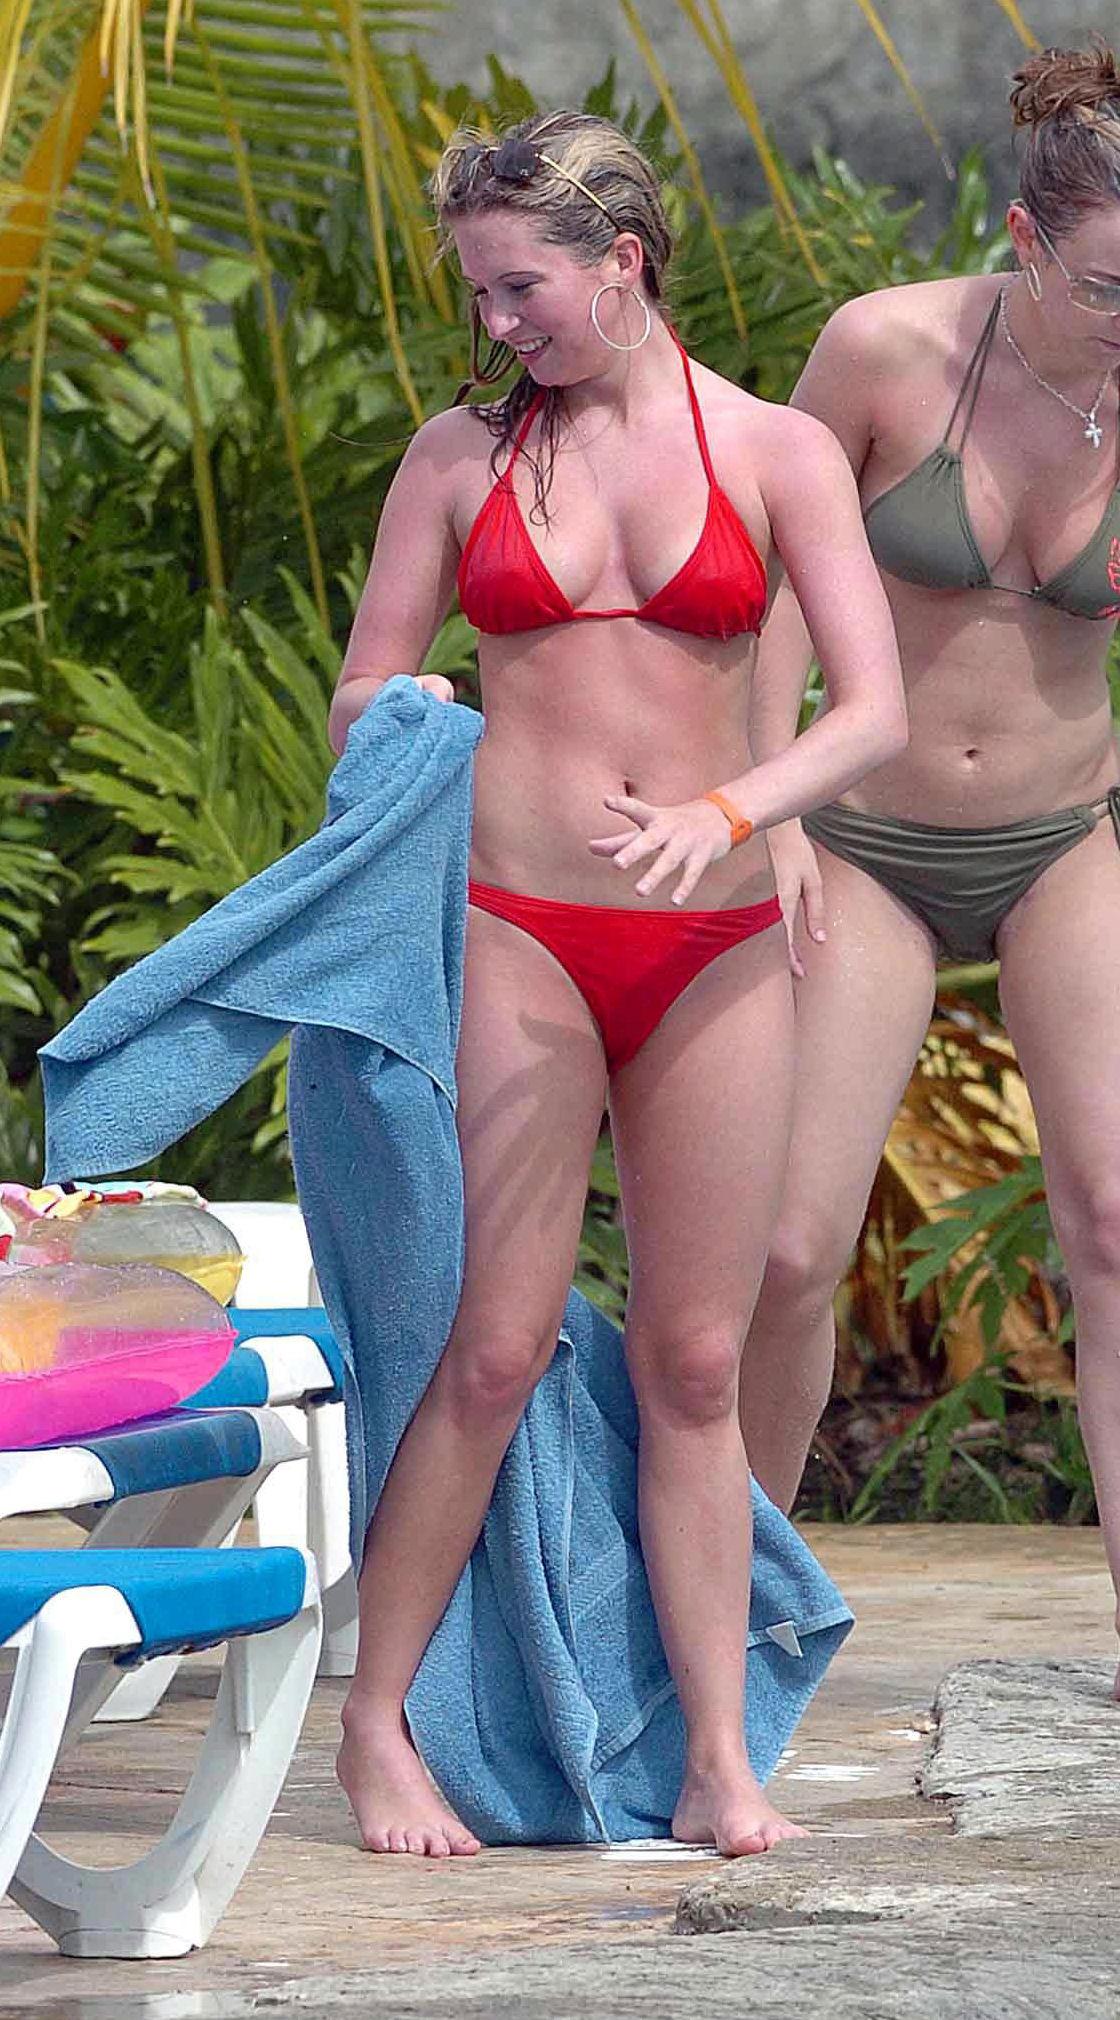 Brooke Kinsella (born 1983) nude (93 foto and video), Ass, Leaked, Boobs, panties 2019